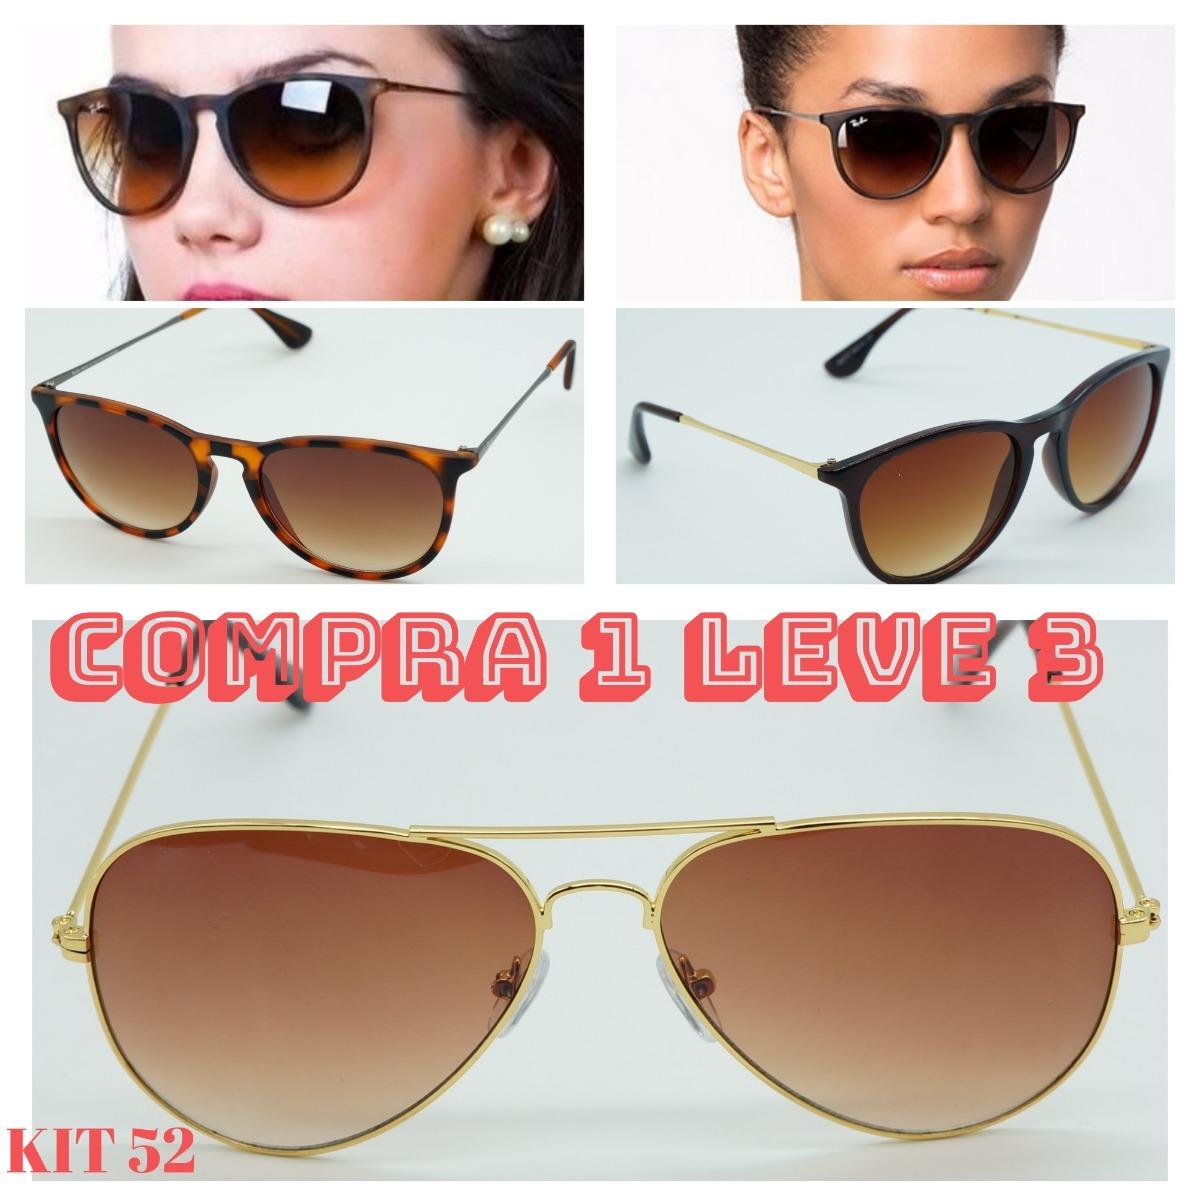 fa5c30da67d0f óculos sol club master justin feminino fosc cristal promoçao. Carregando  zoom.